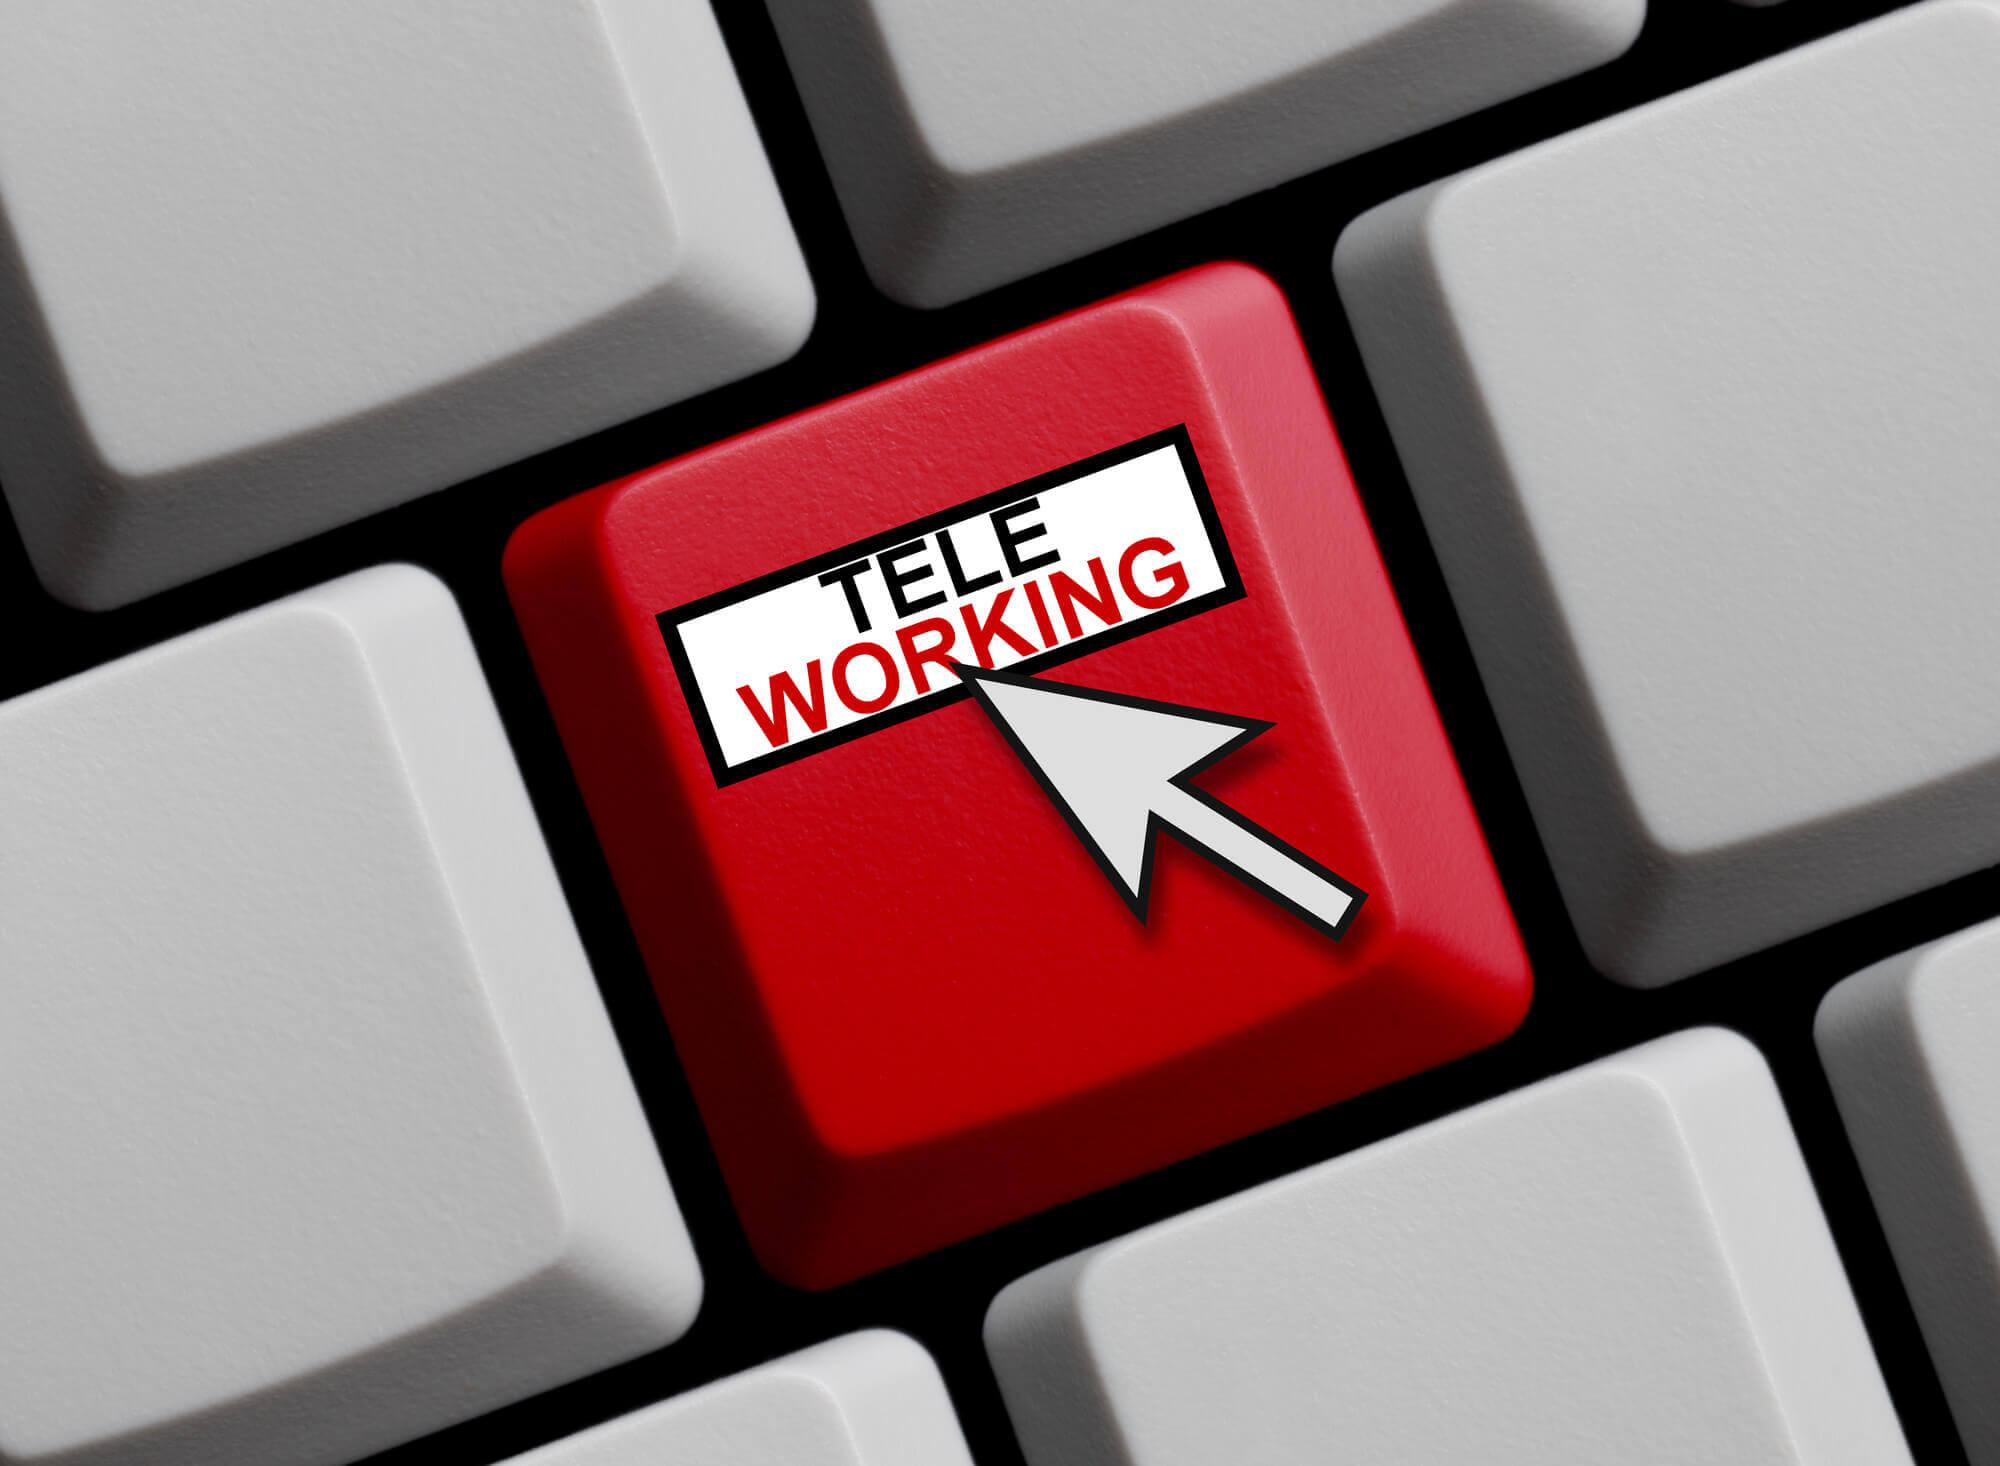 remote working button